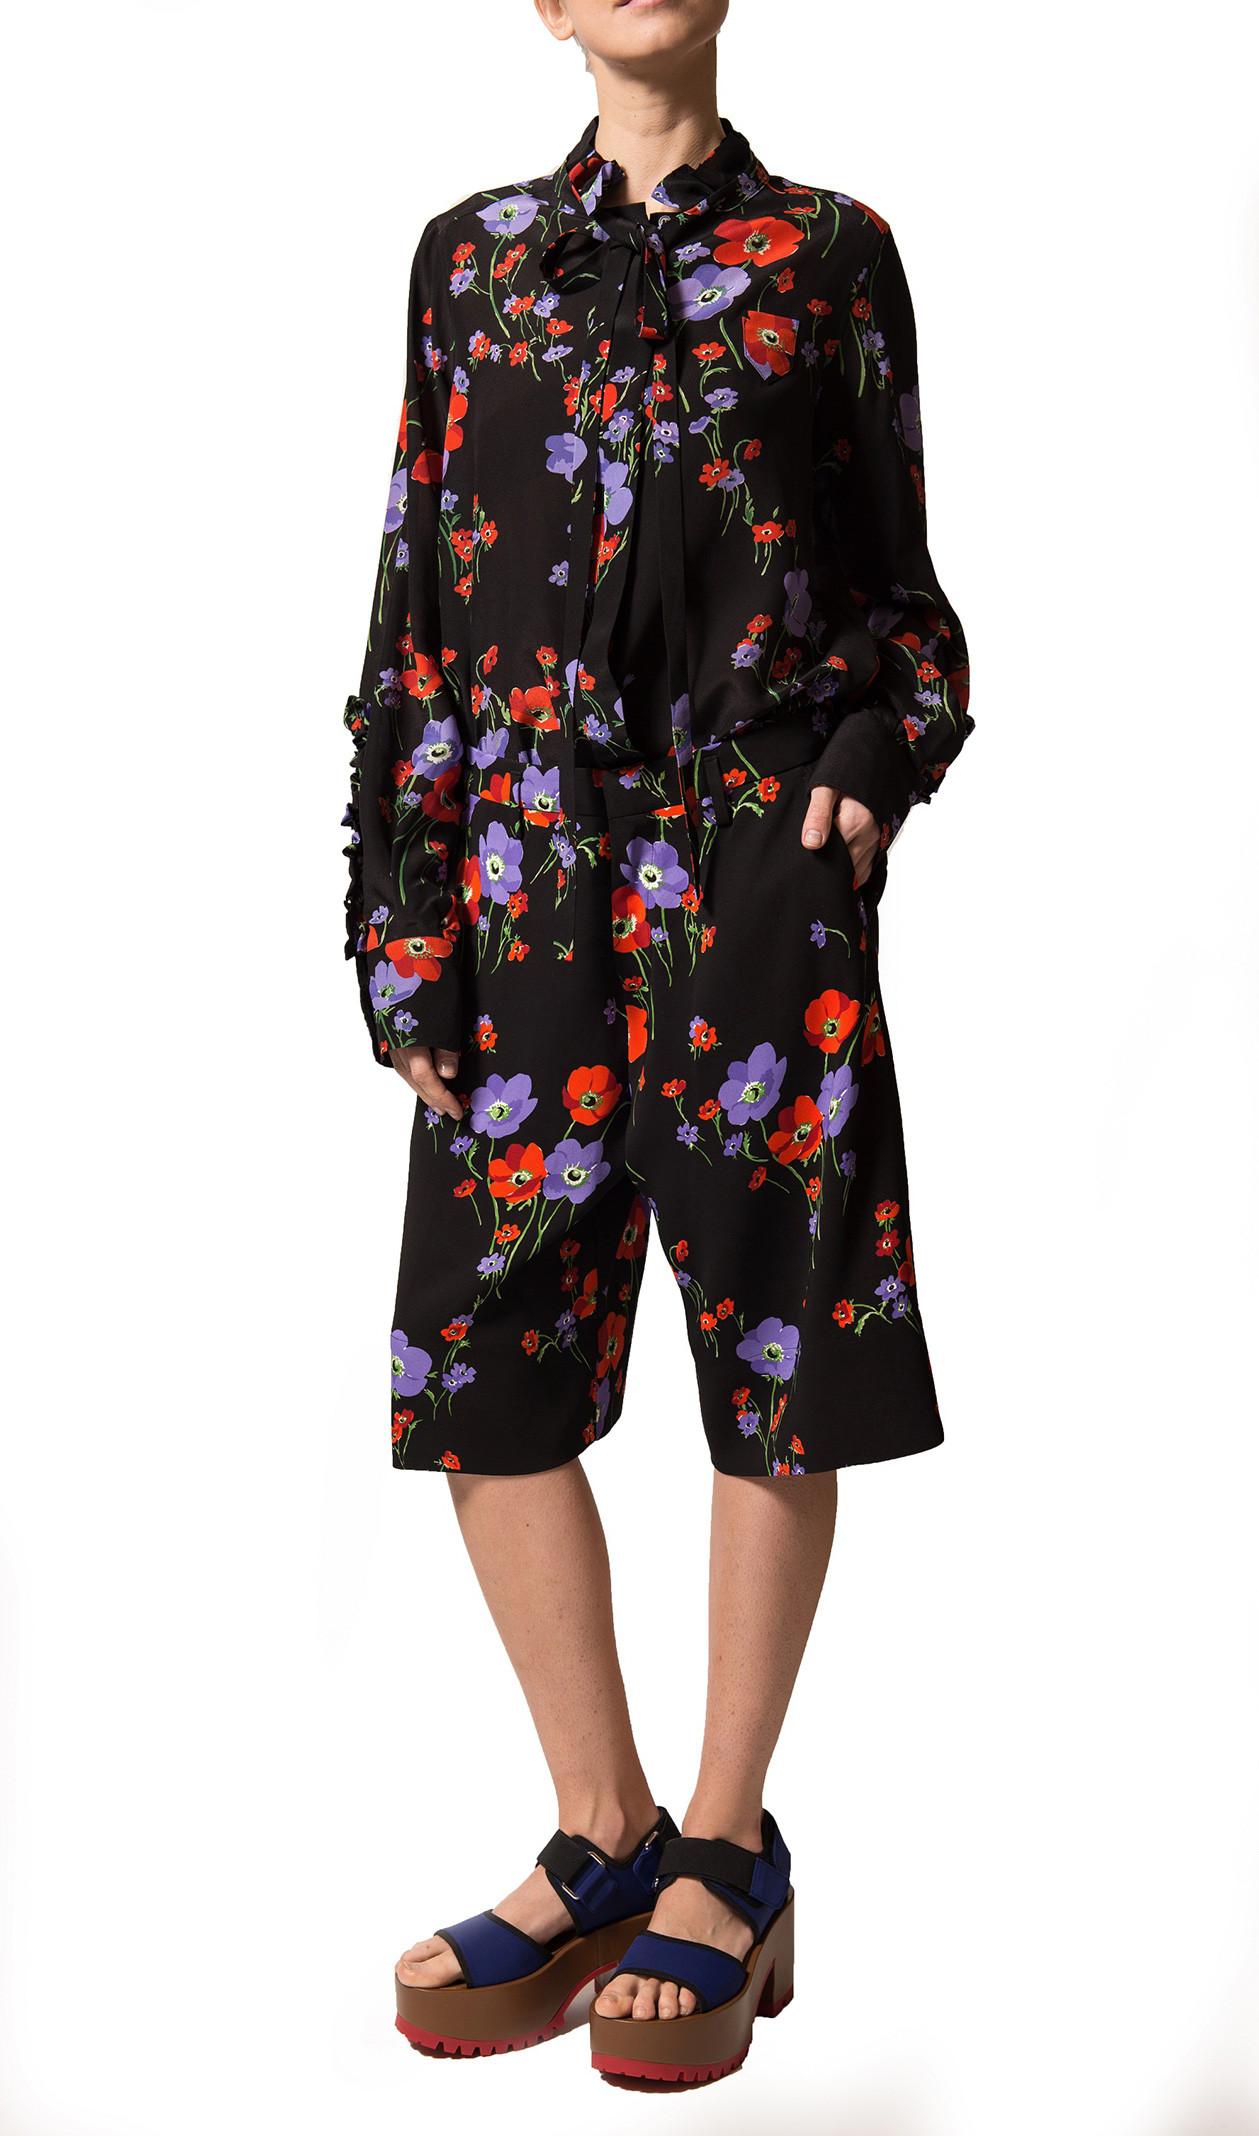 N.21 Floral Print Shorts